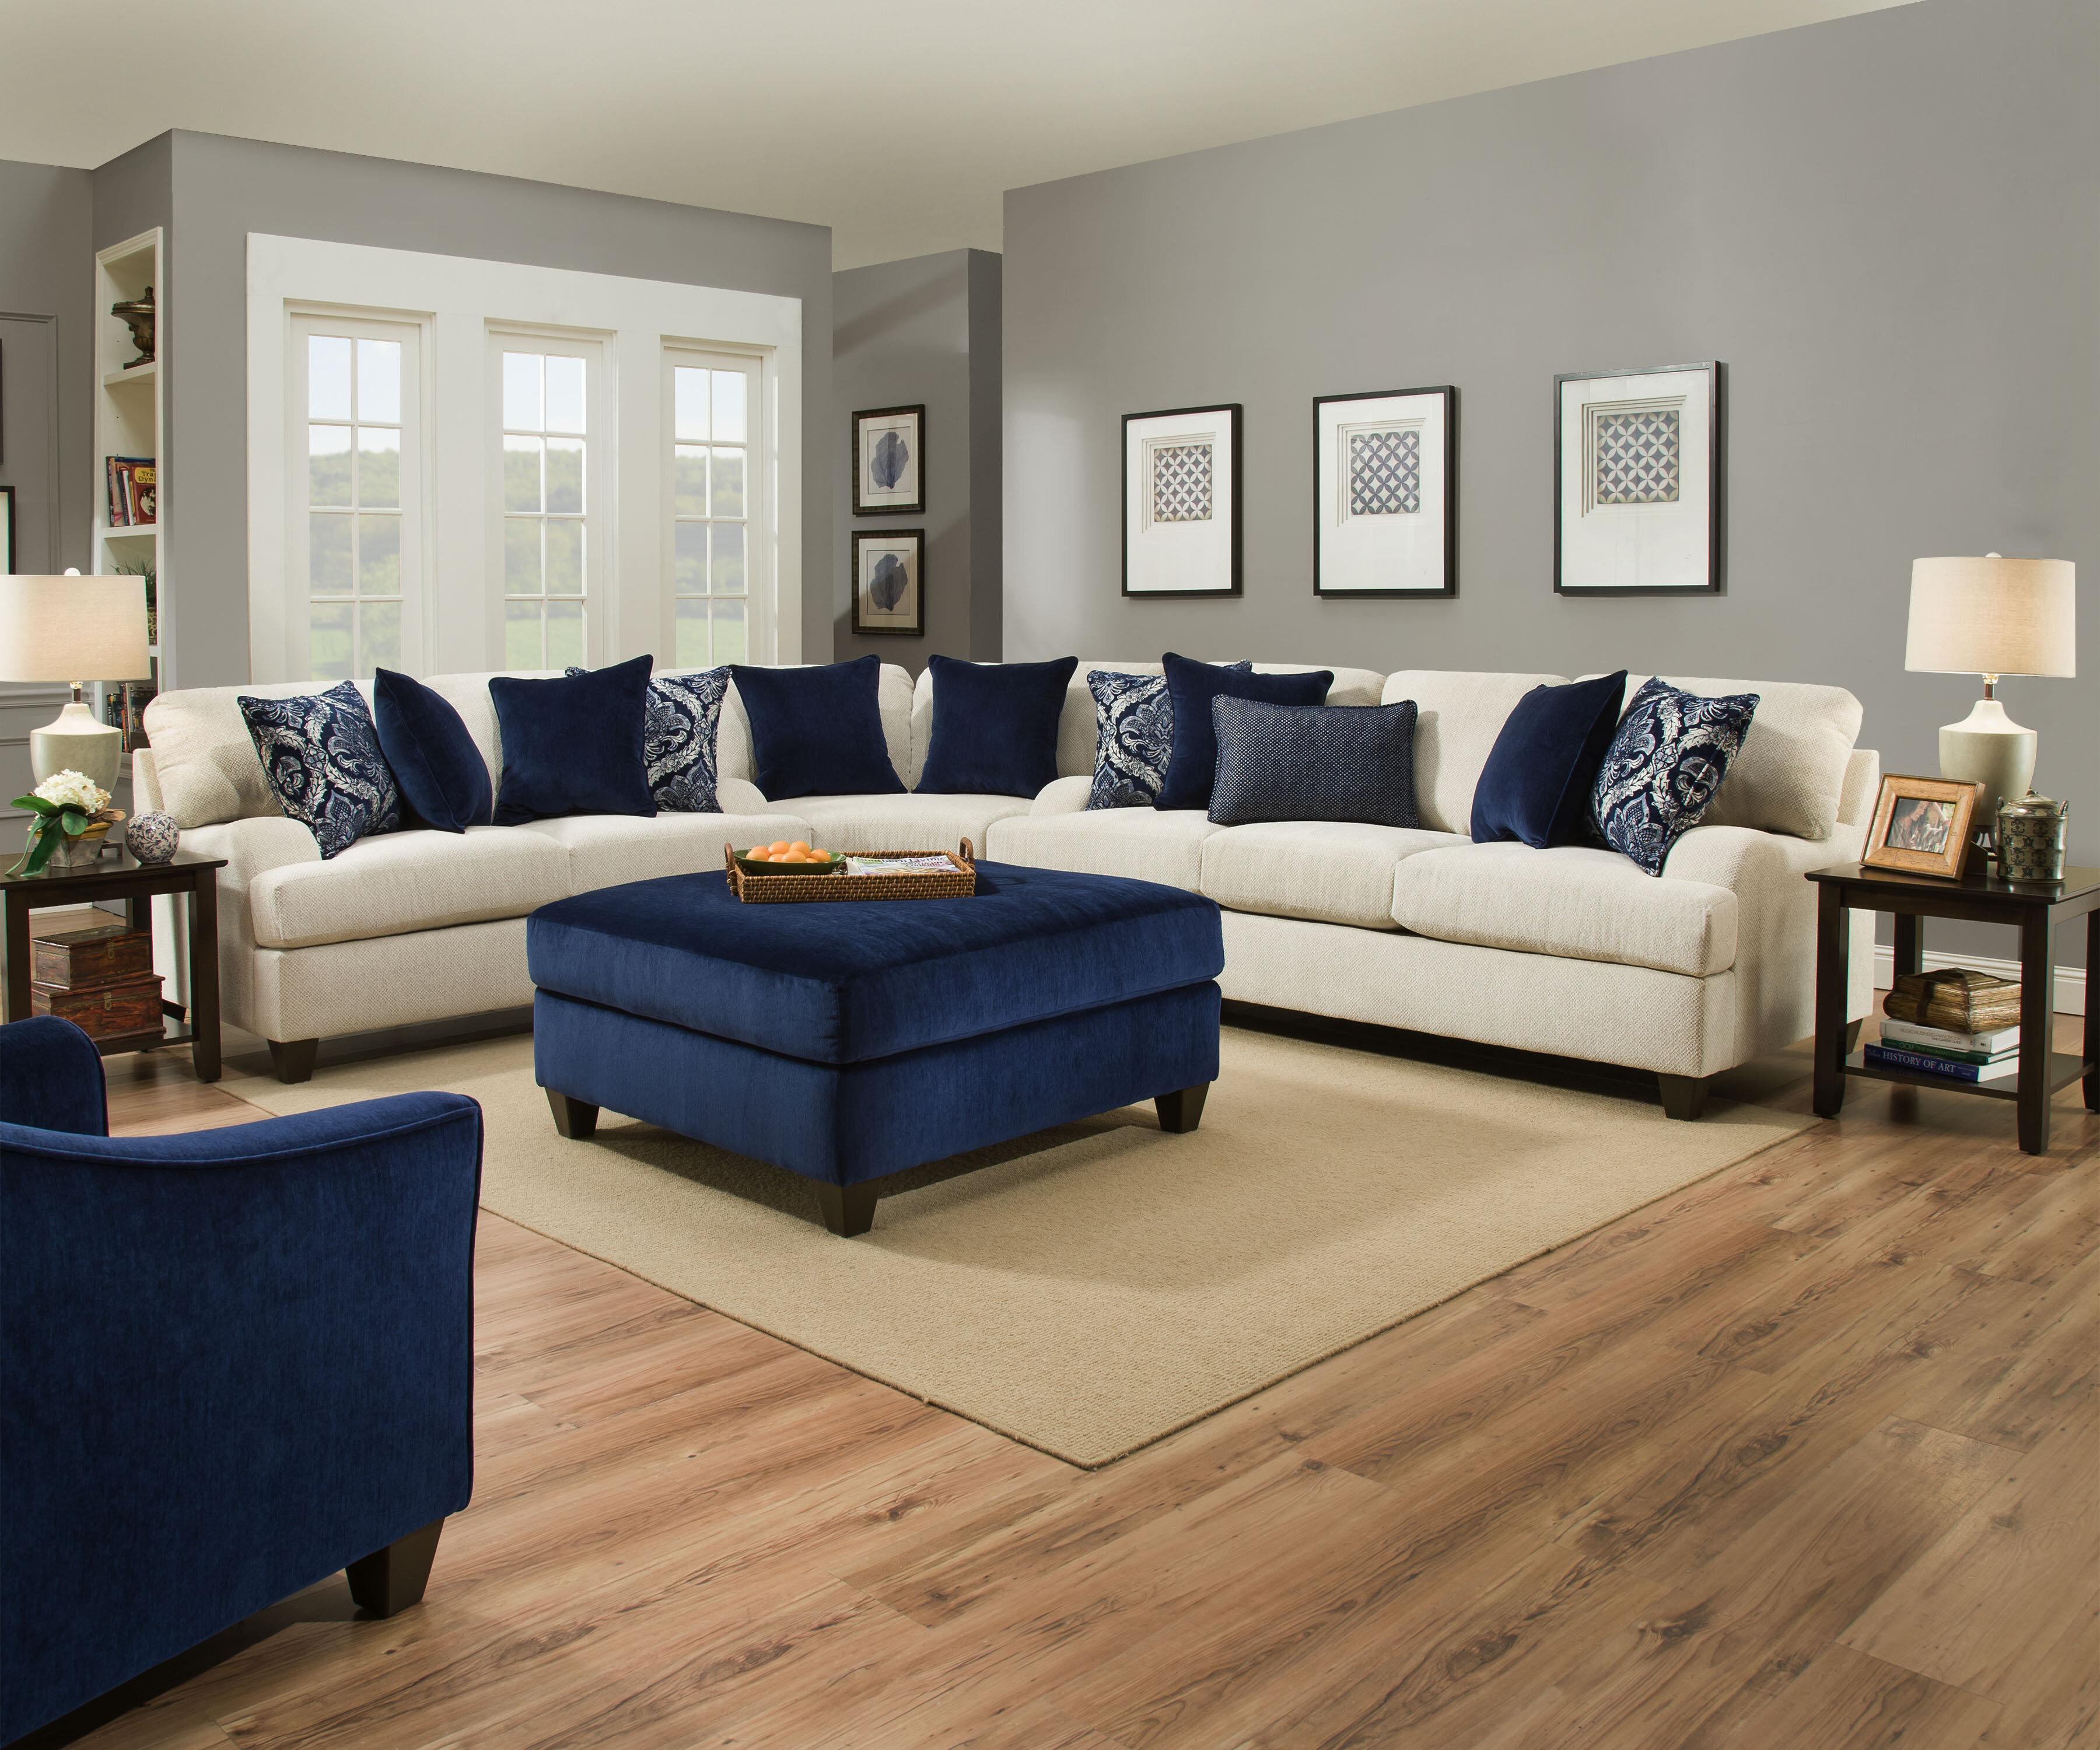 Three Posts Hattiesburg Configurable Living Room Set & Reviews